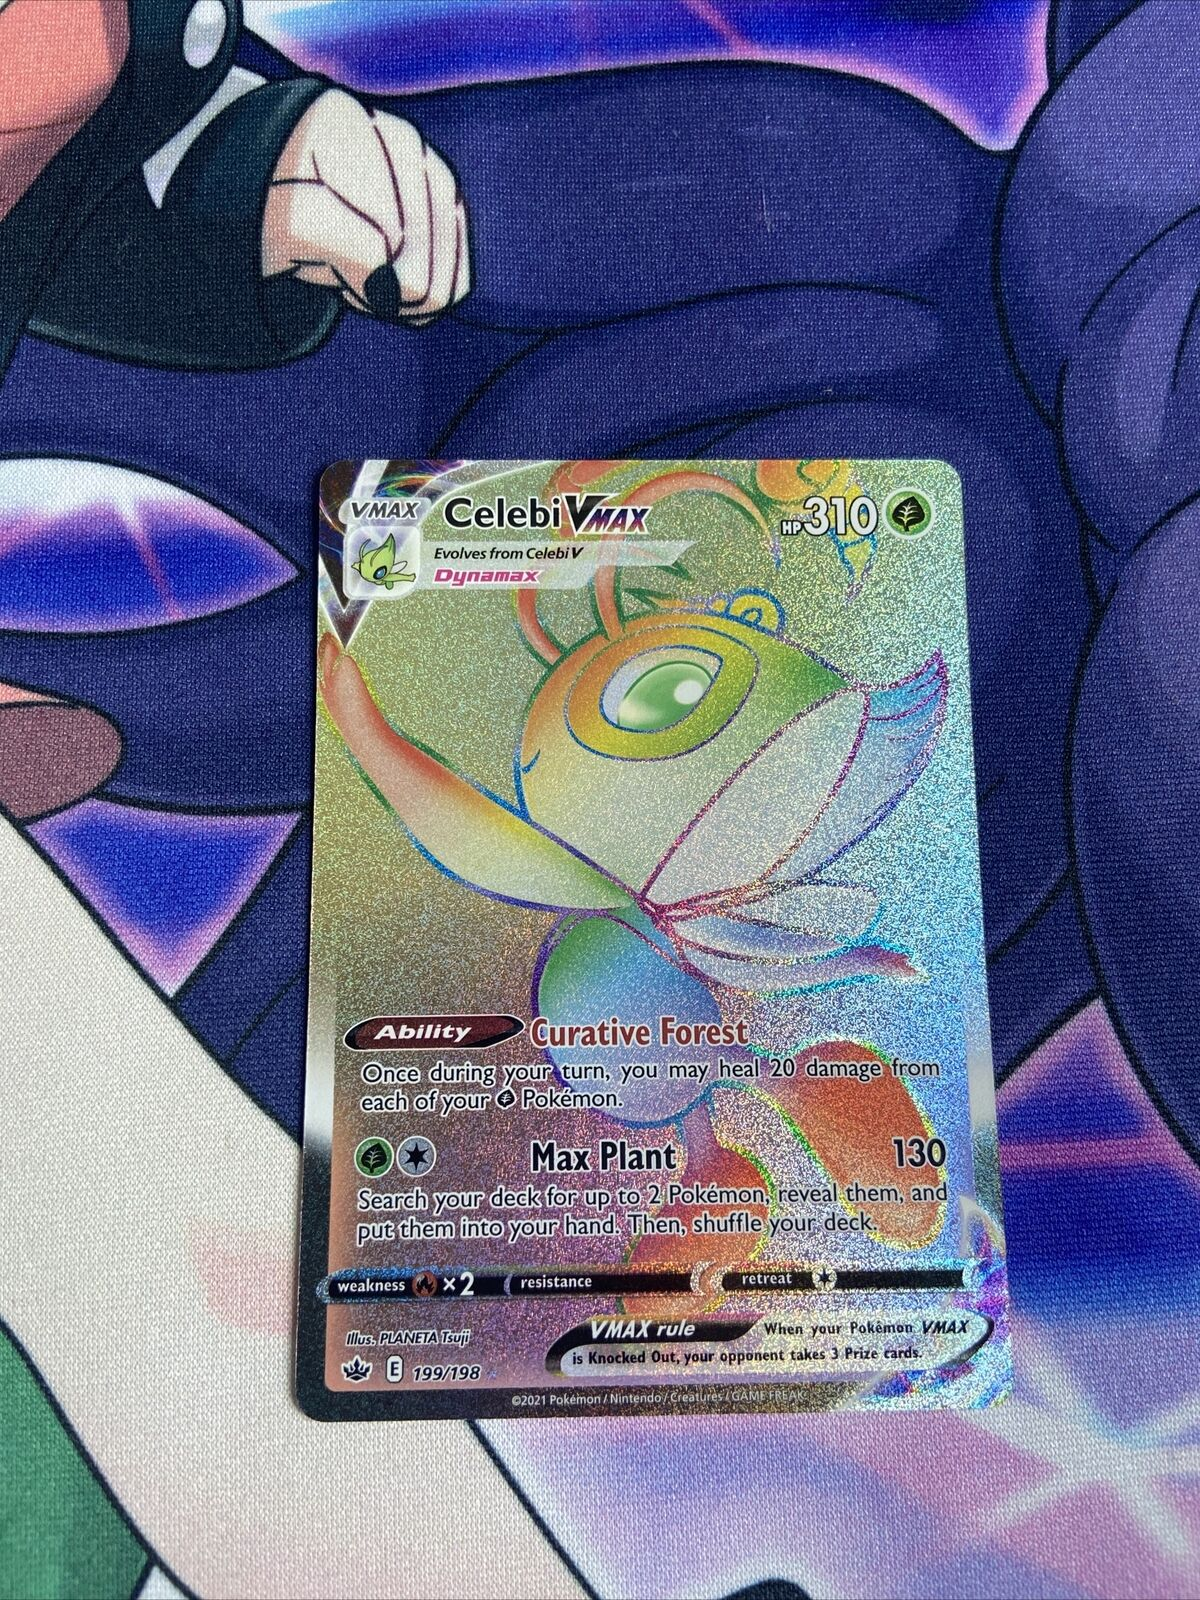 Pokémon TCG Rainbow Rare Celebi VMAX -Secret Rare -199/198 - Chilling Reign Mint